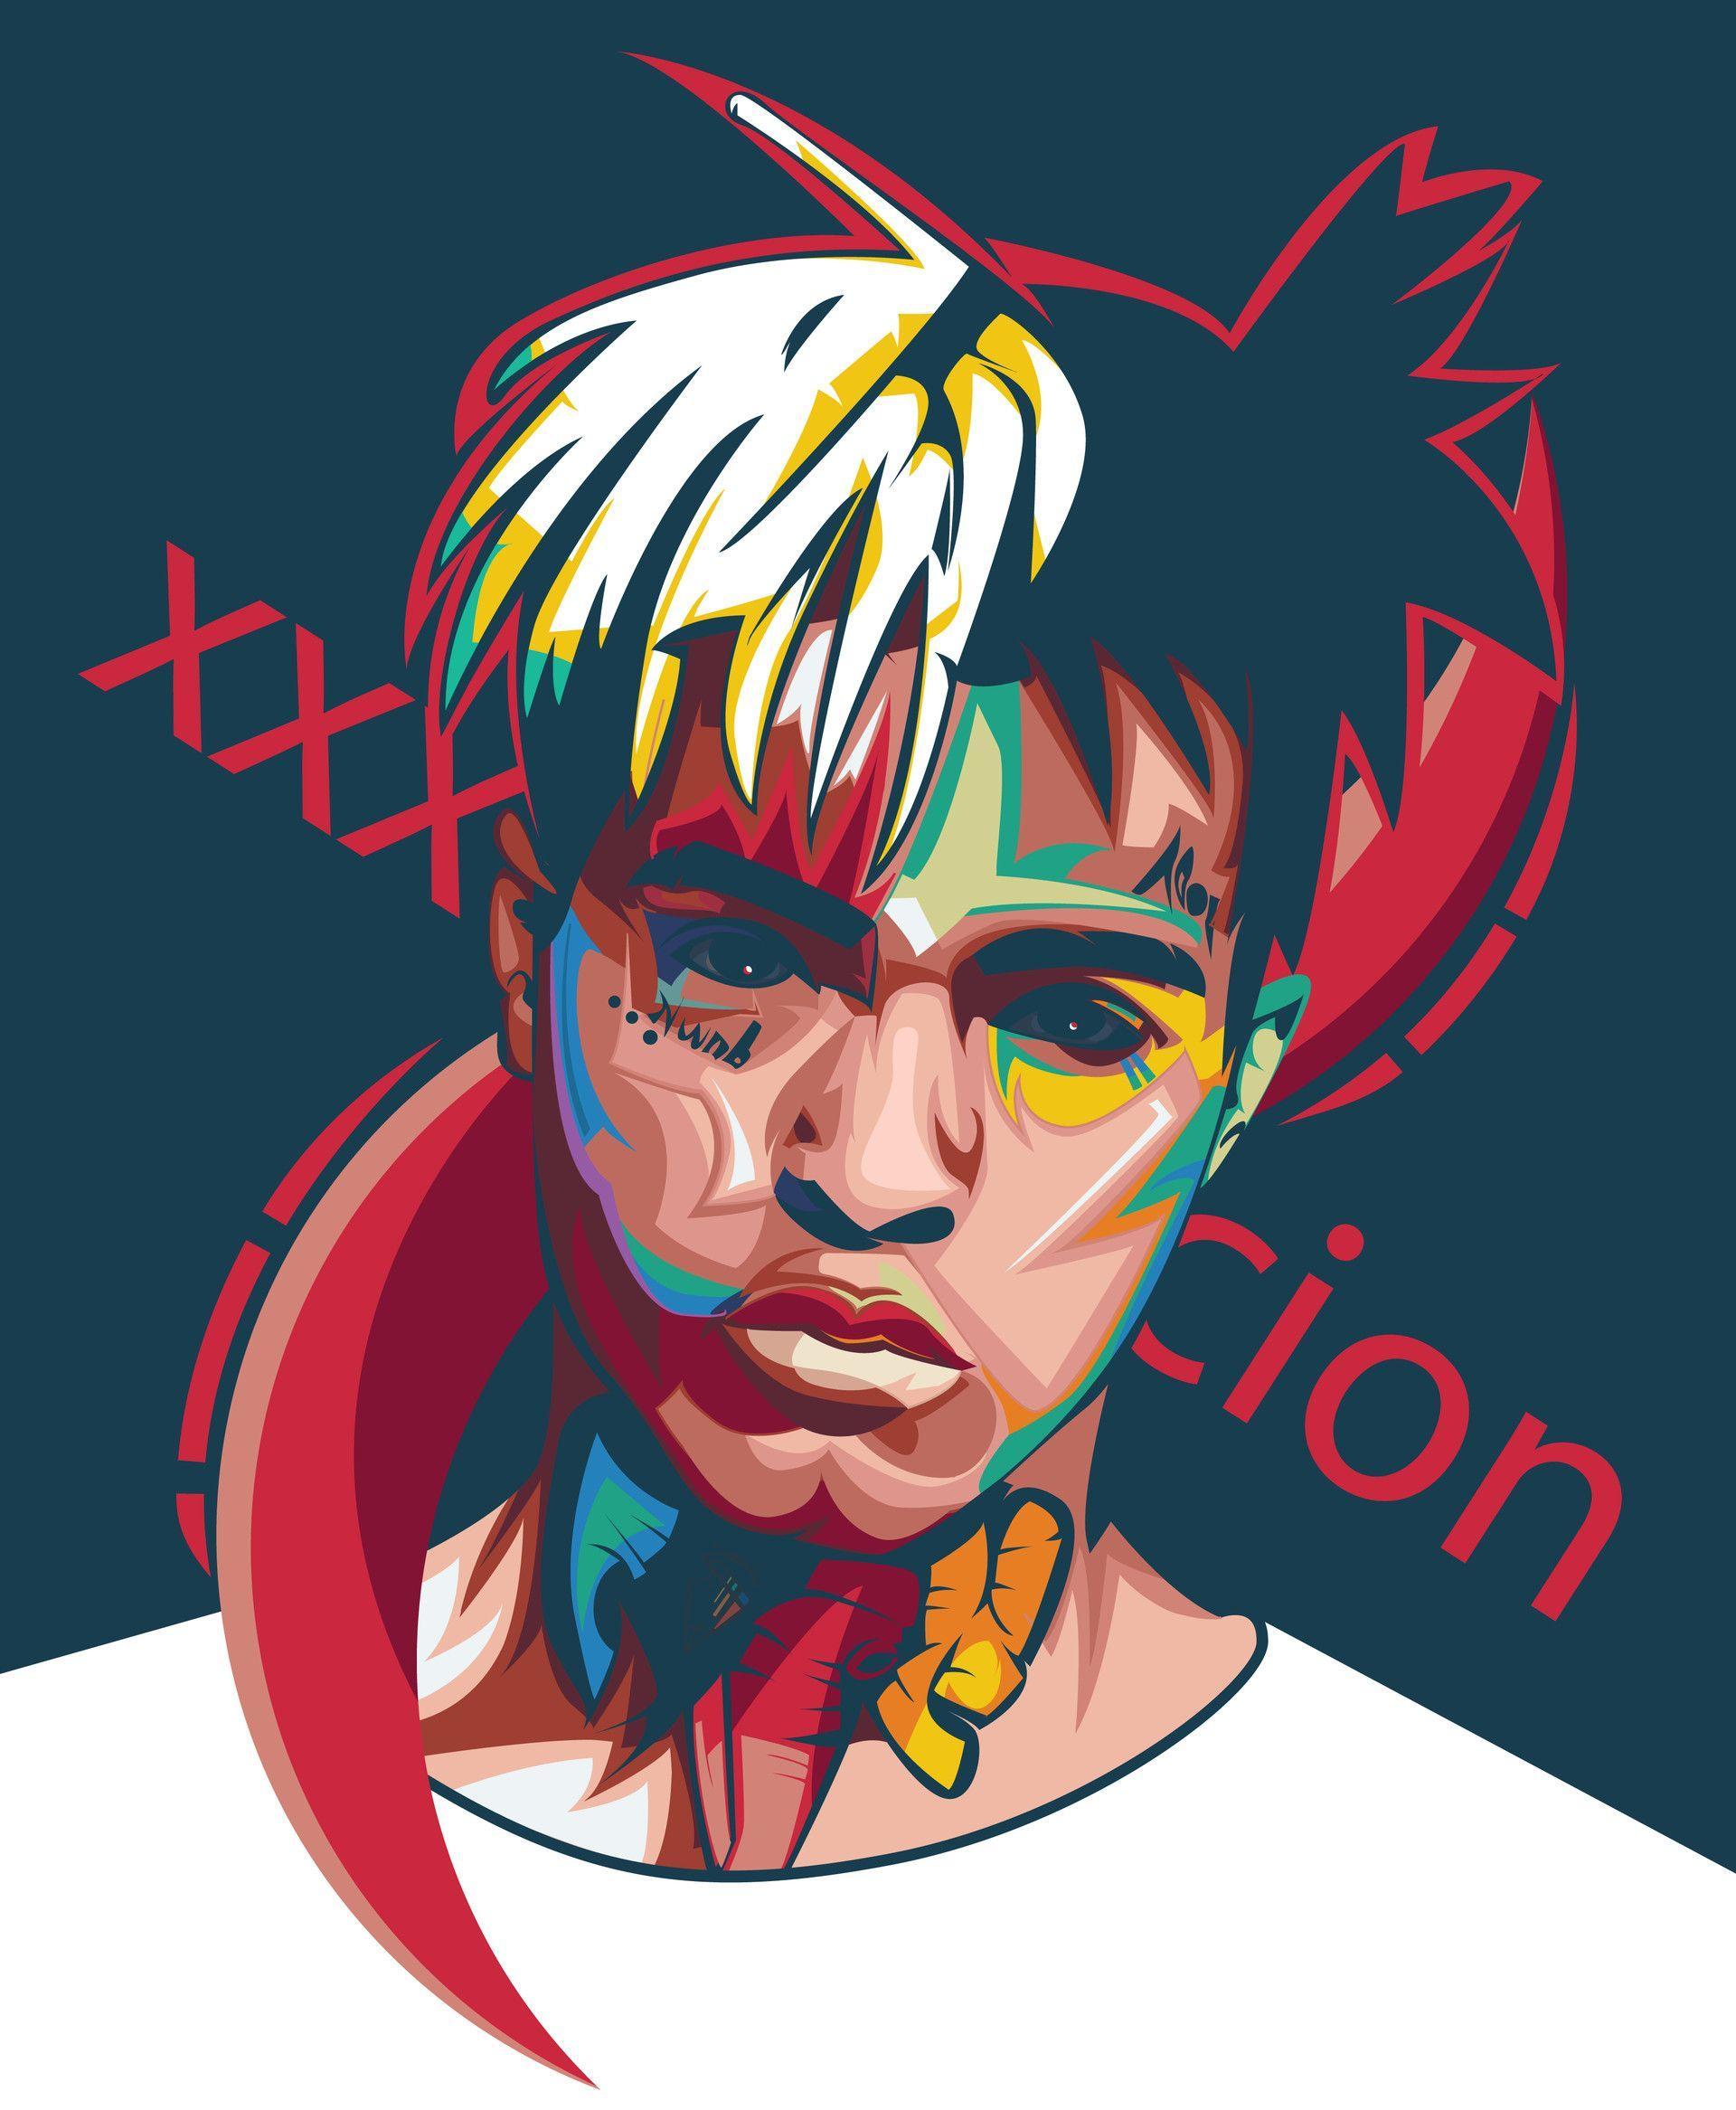 Xxxtentacion Cartoon 1080X1080 Wallpapers